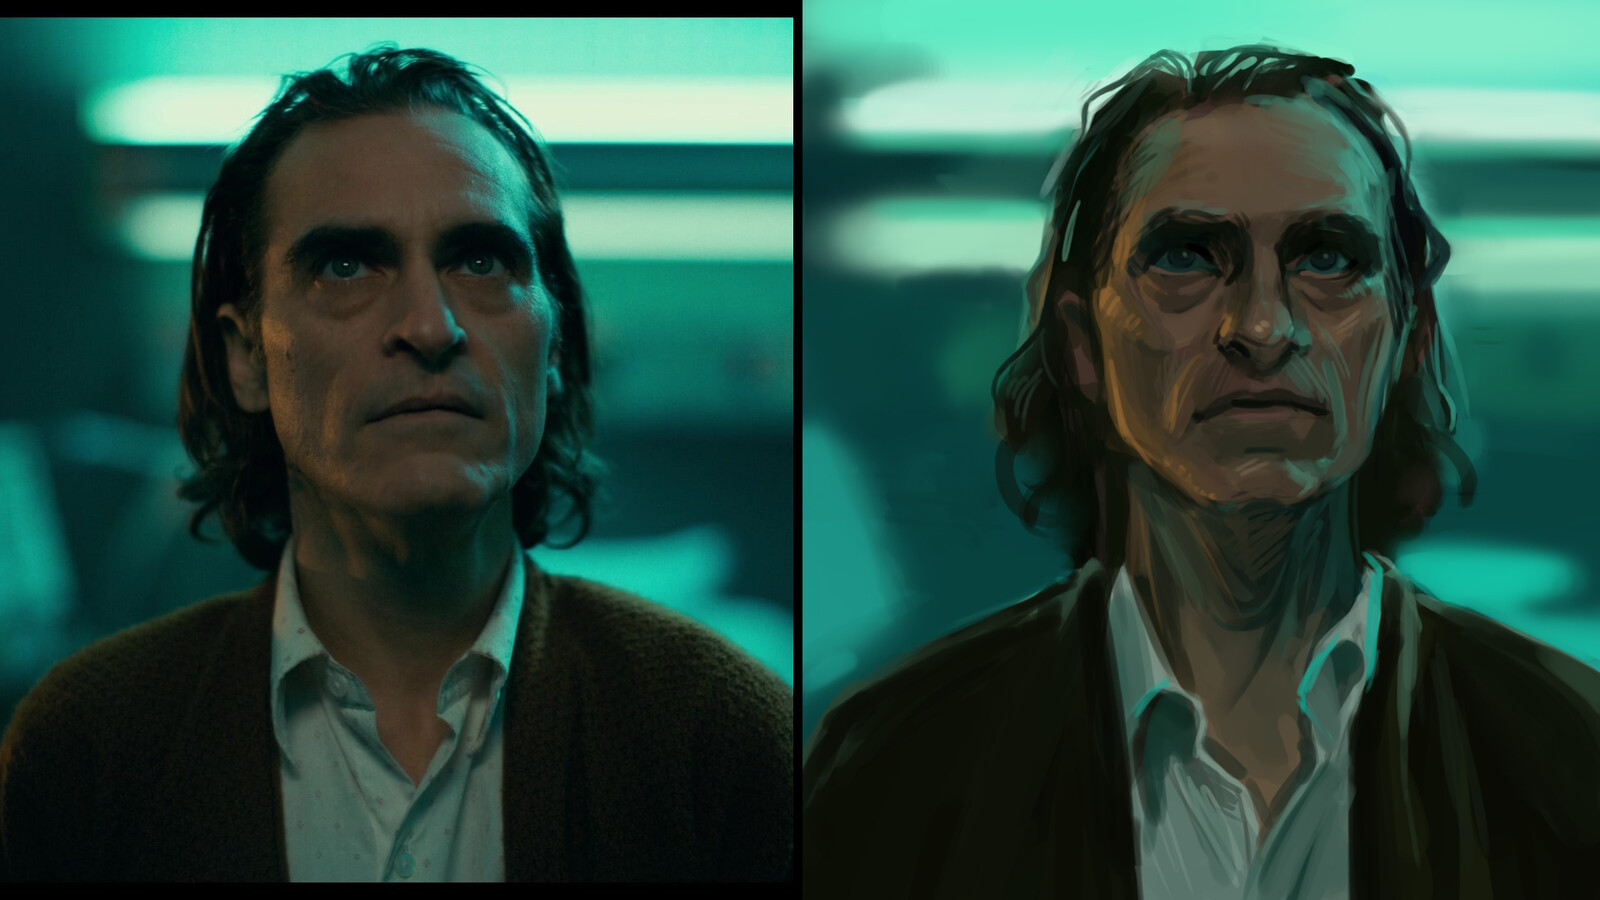 Study of Joaquin Phoenix from Joker. Around 90-100 minutes.